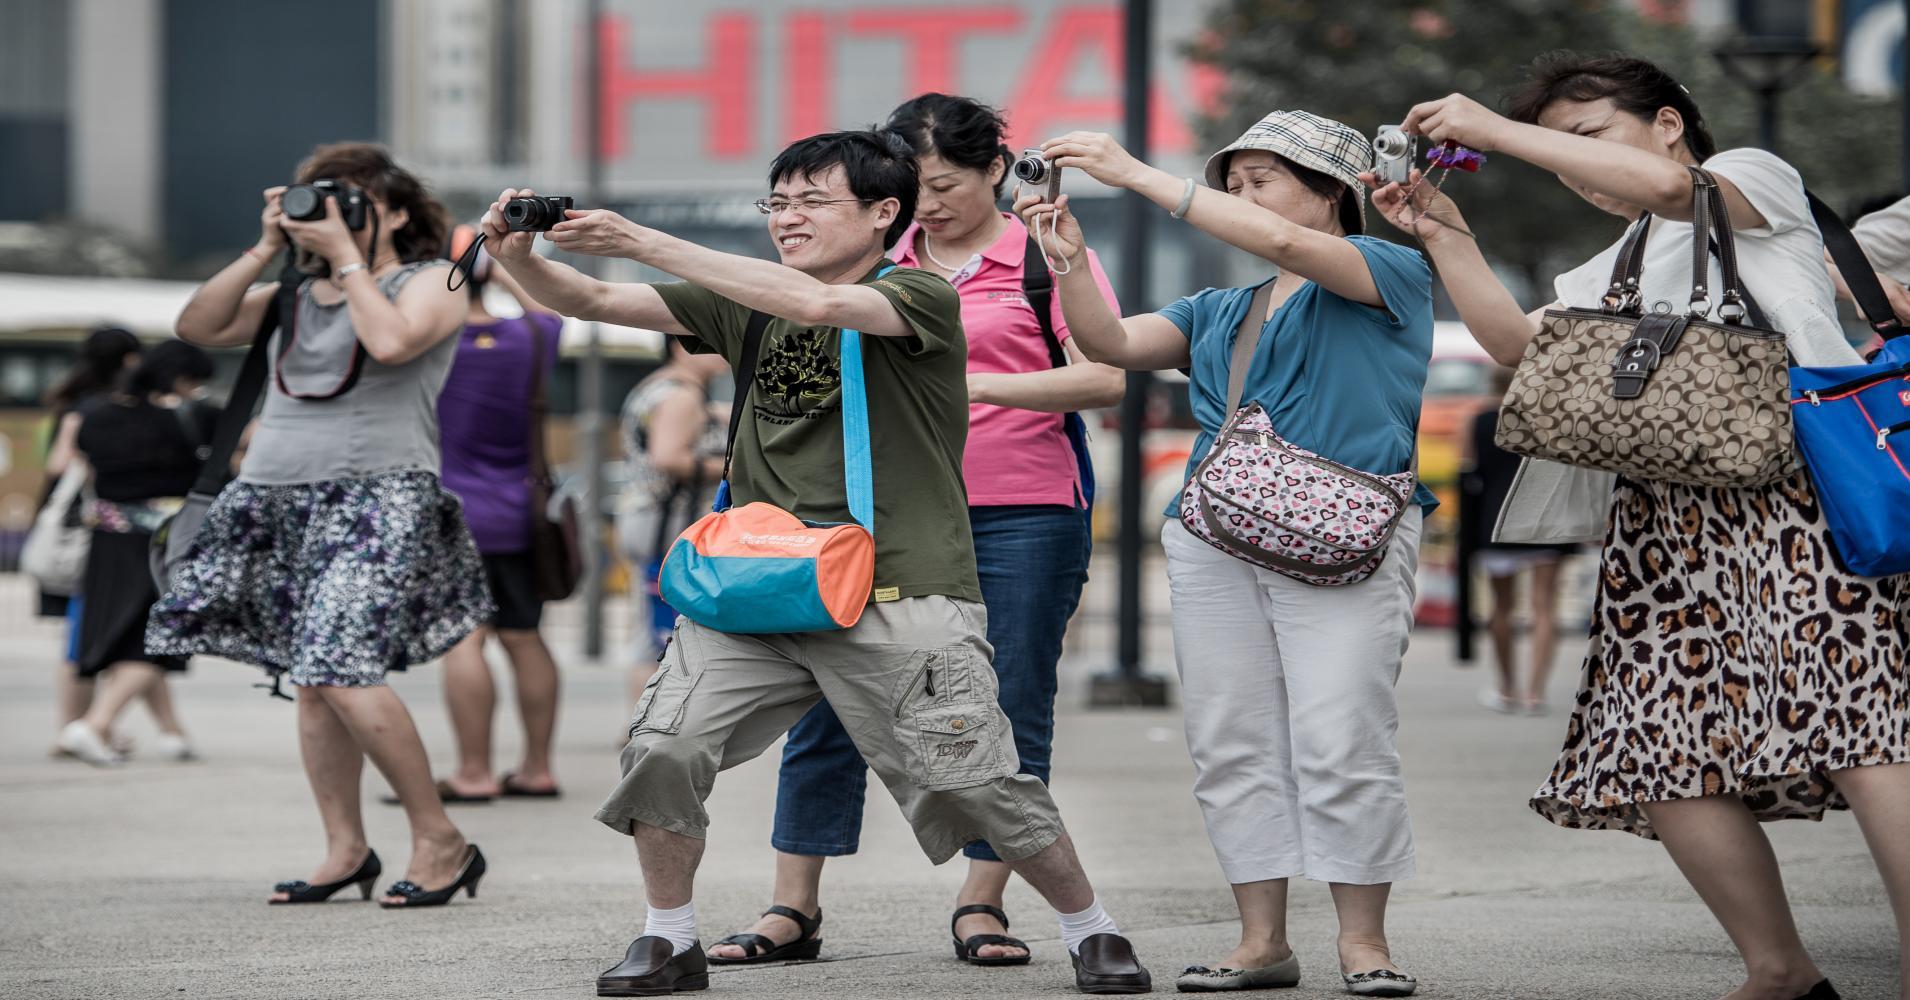 Go to Kinezi preplavili Beograd